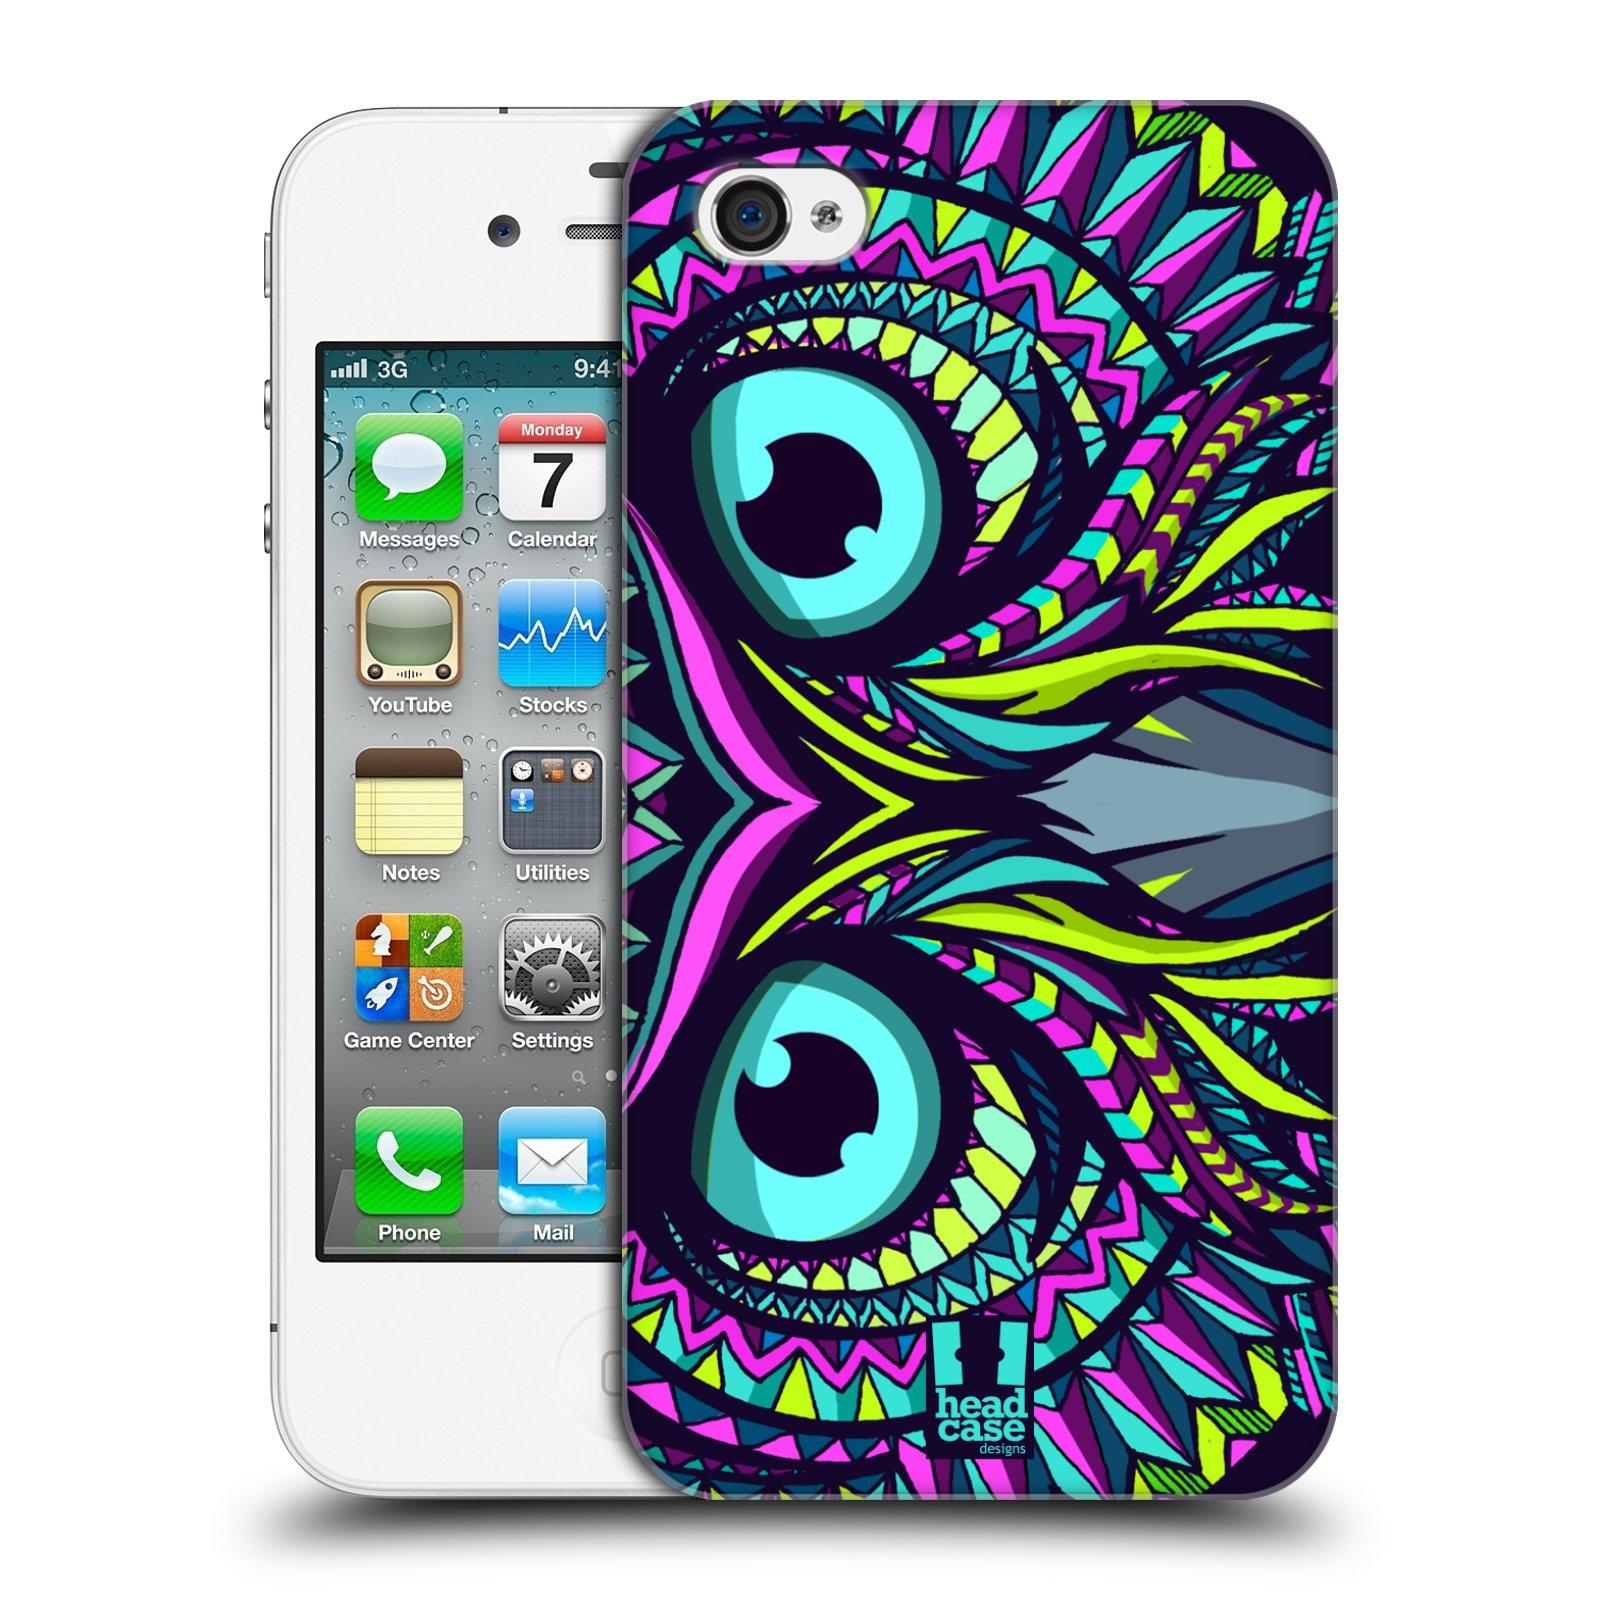 Plastové pouzdro na mobil Apple iPhone 4 a 4S HEAD CASE AZTEC SOVA